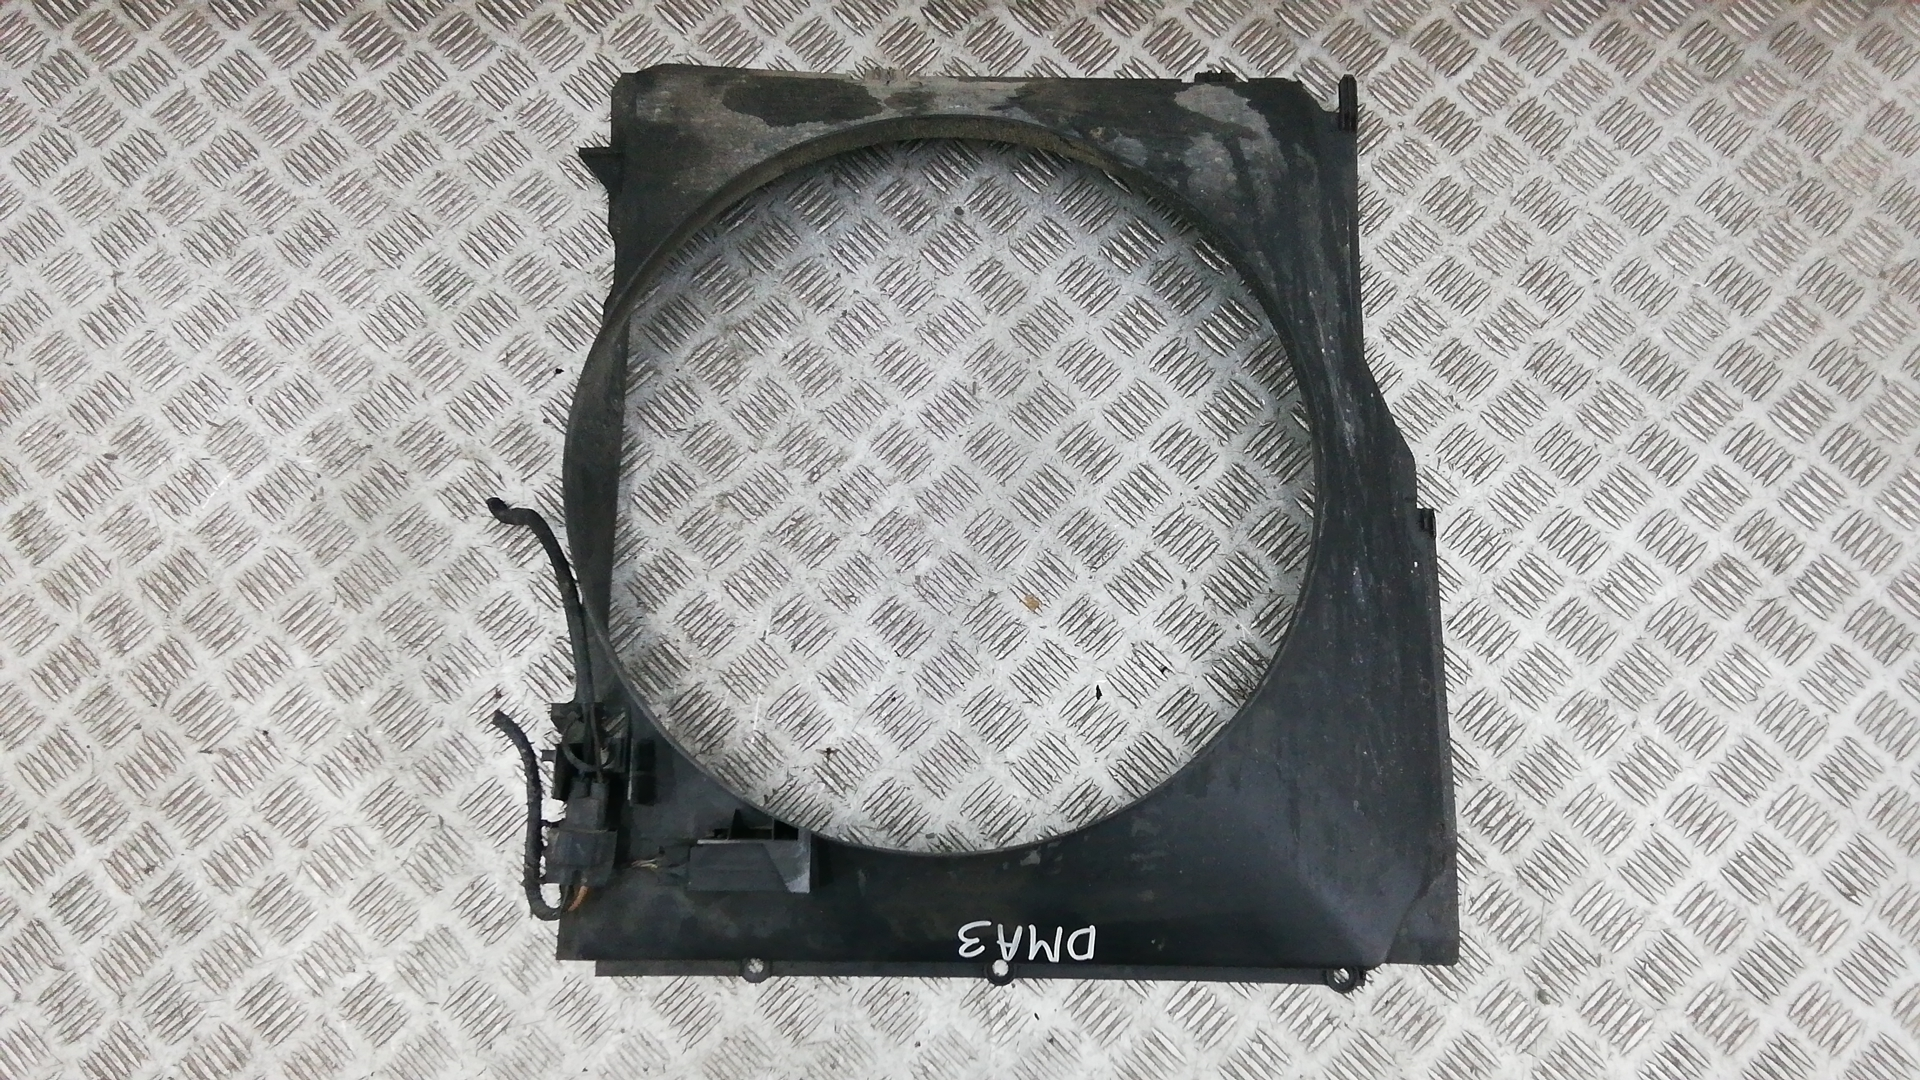 Диффузор вентилятора, BMW, X5 E53, 2005